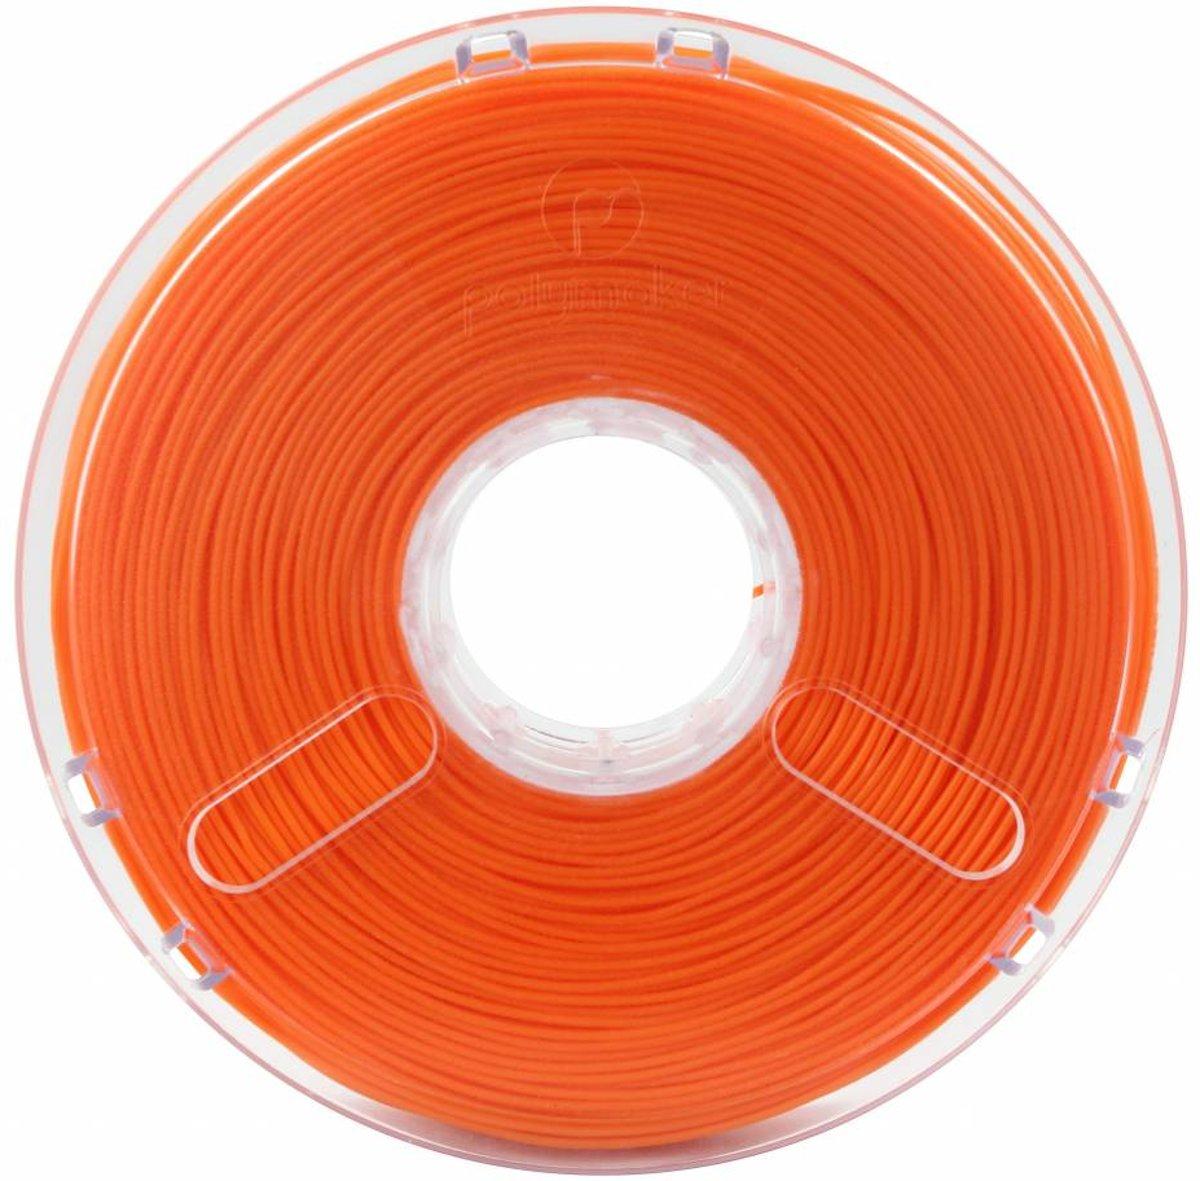 Polymaker Filament voor 3D-printer PolyMax PLA Jam Free Technology 2.85 mm 0.75 kg - True Orange